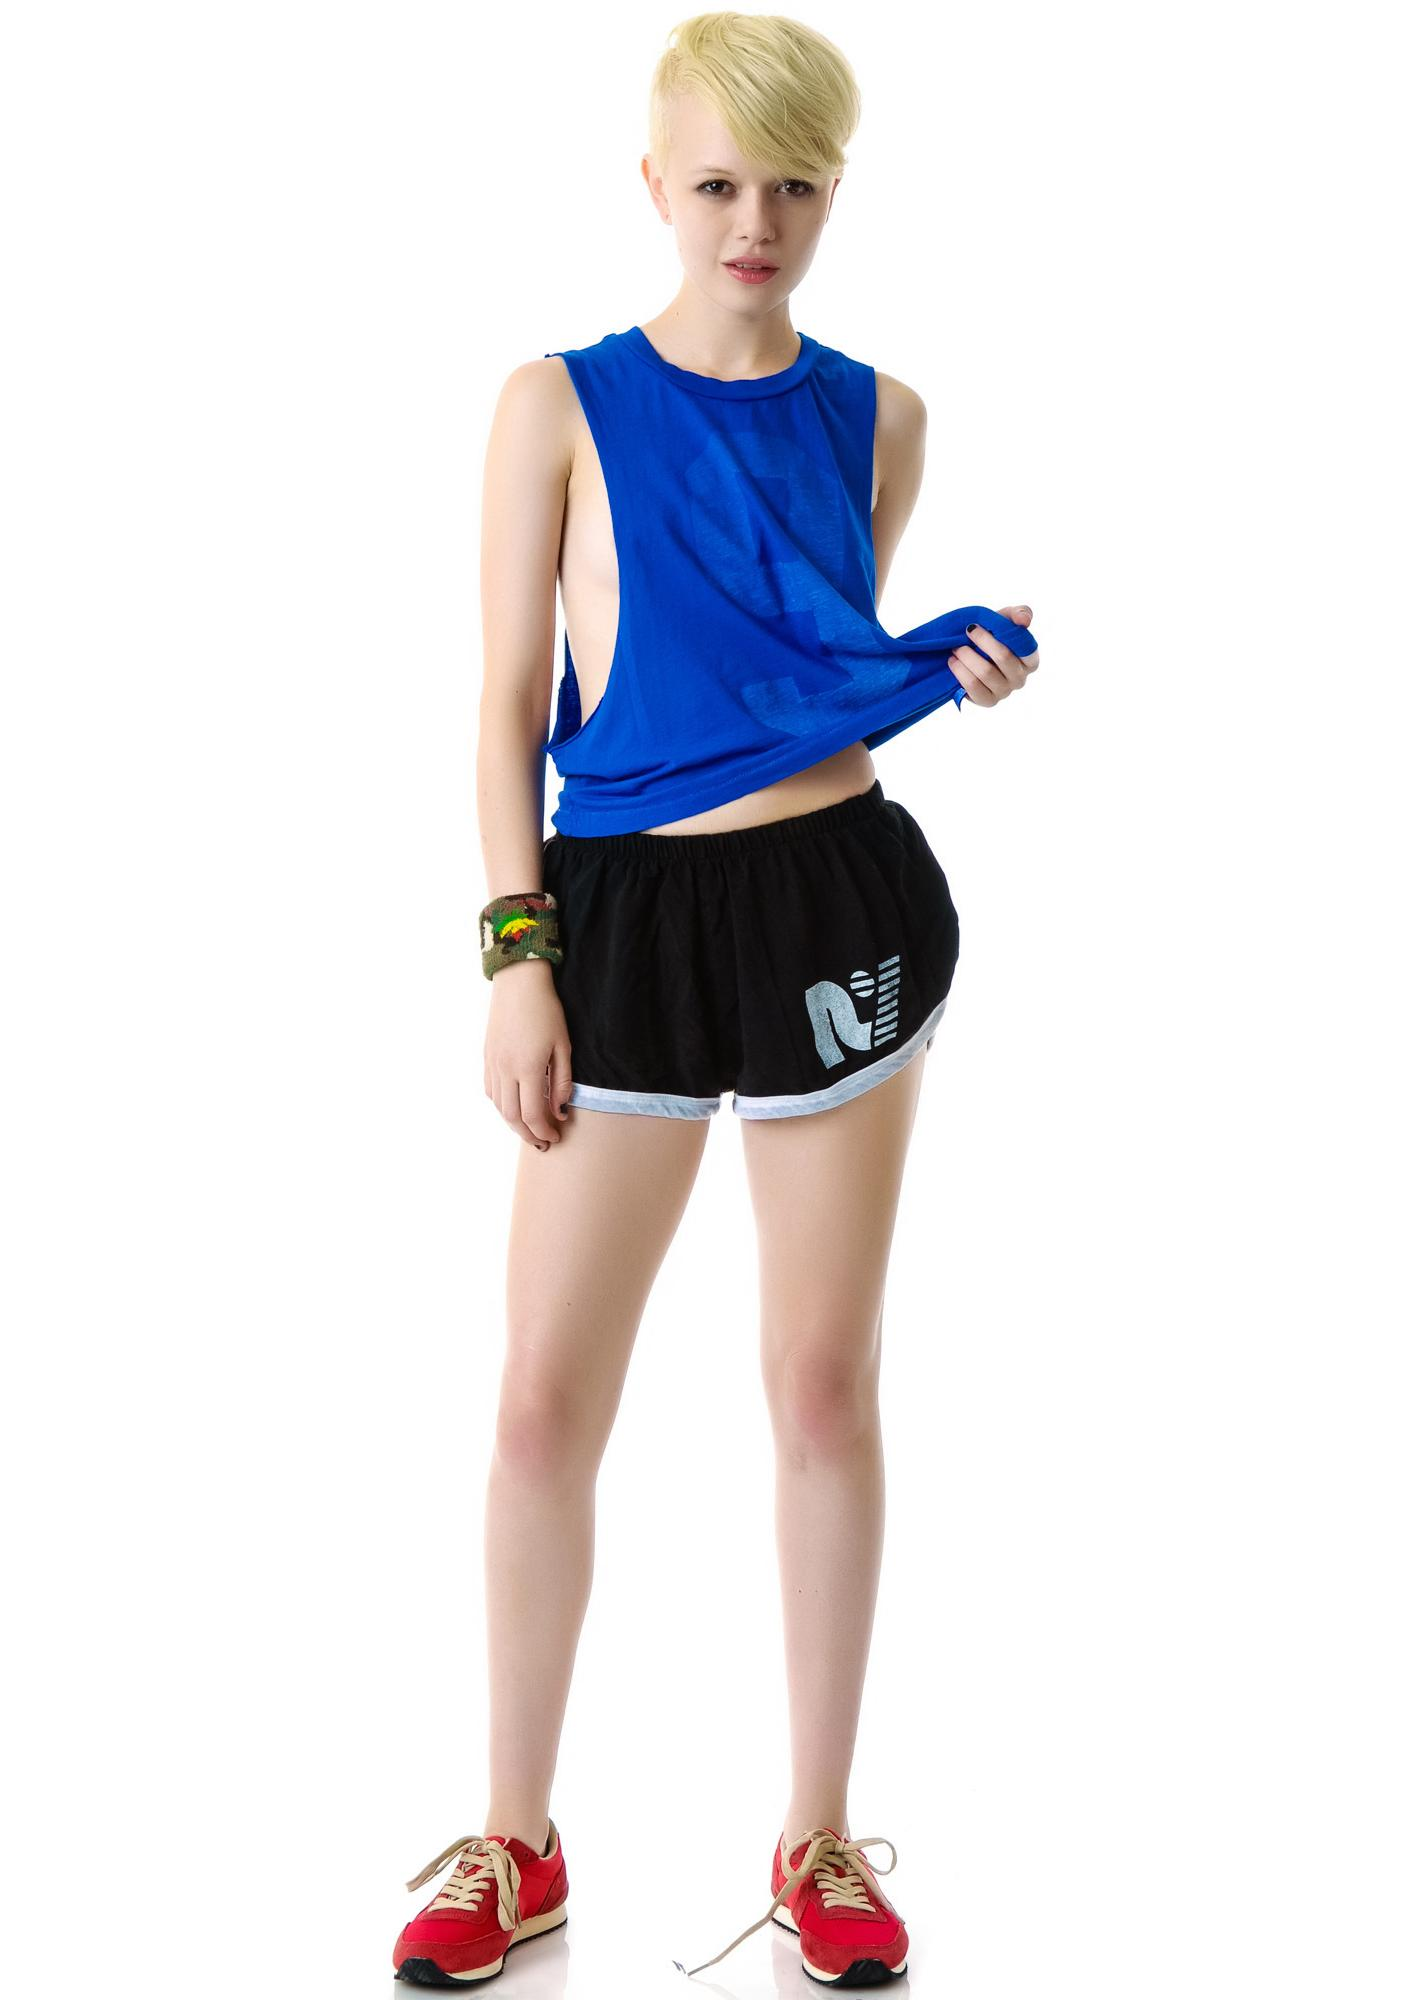 Rebel Yell Jogging Shorts